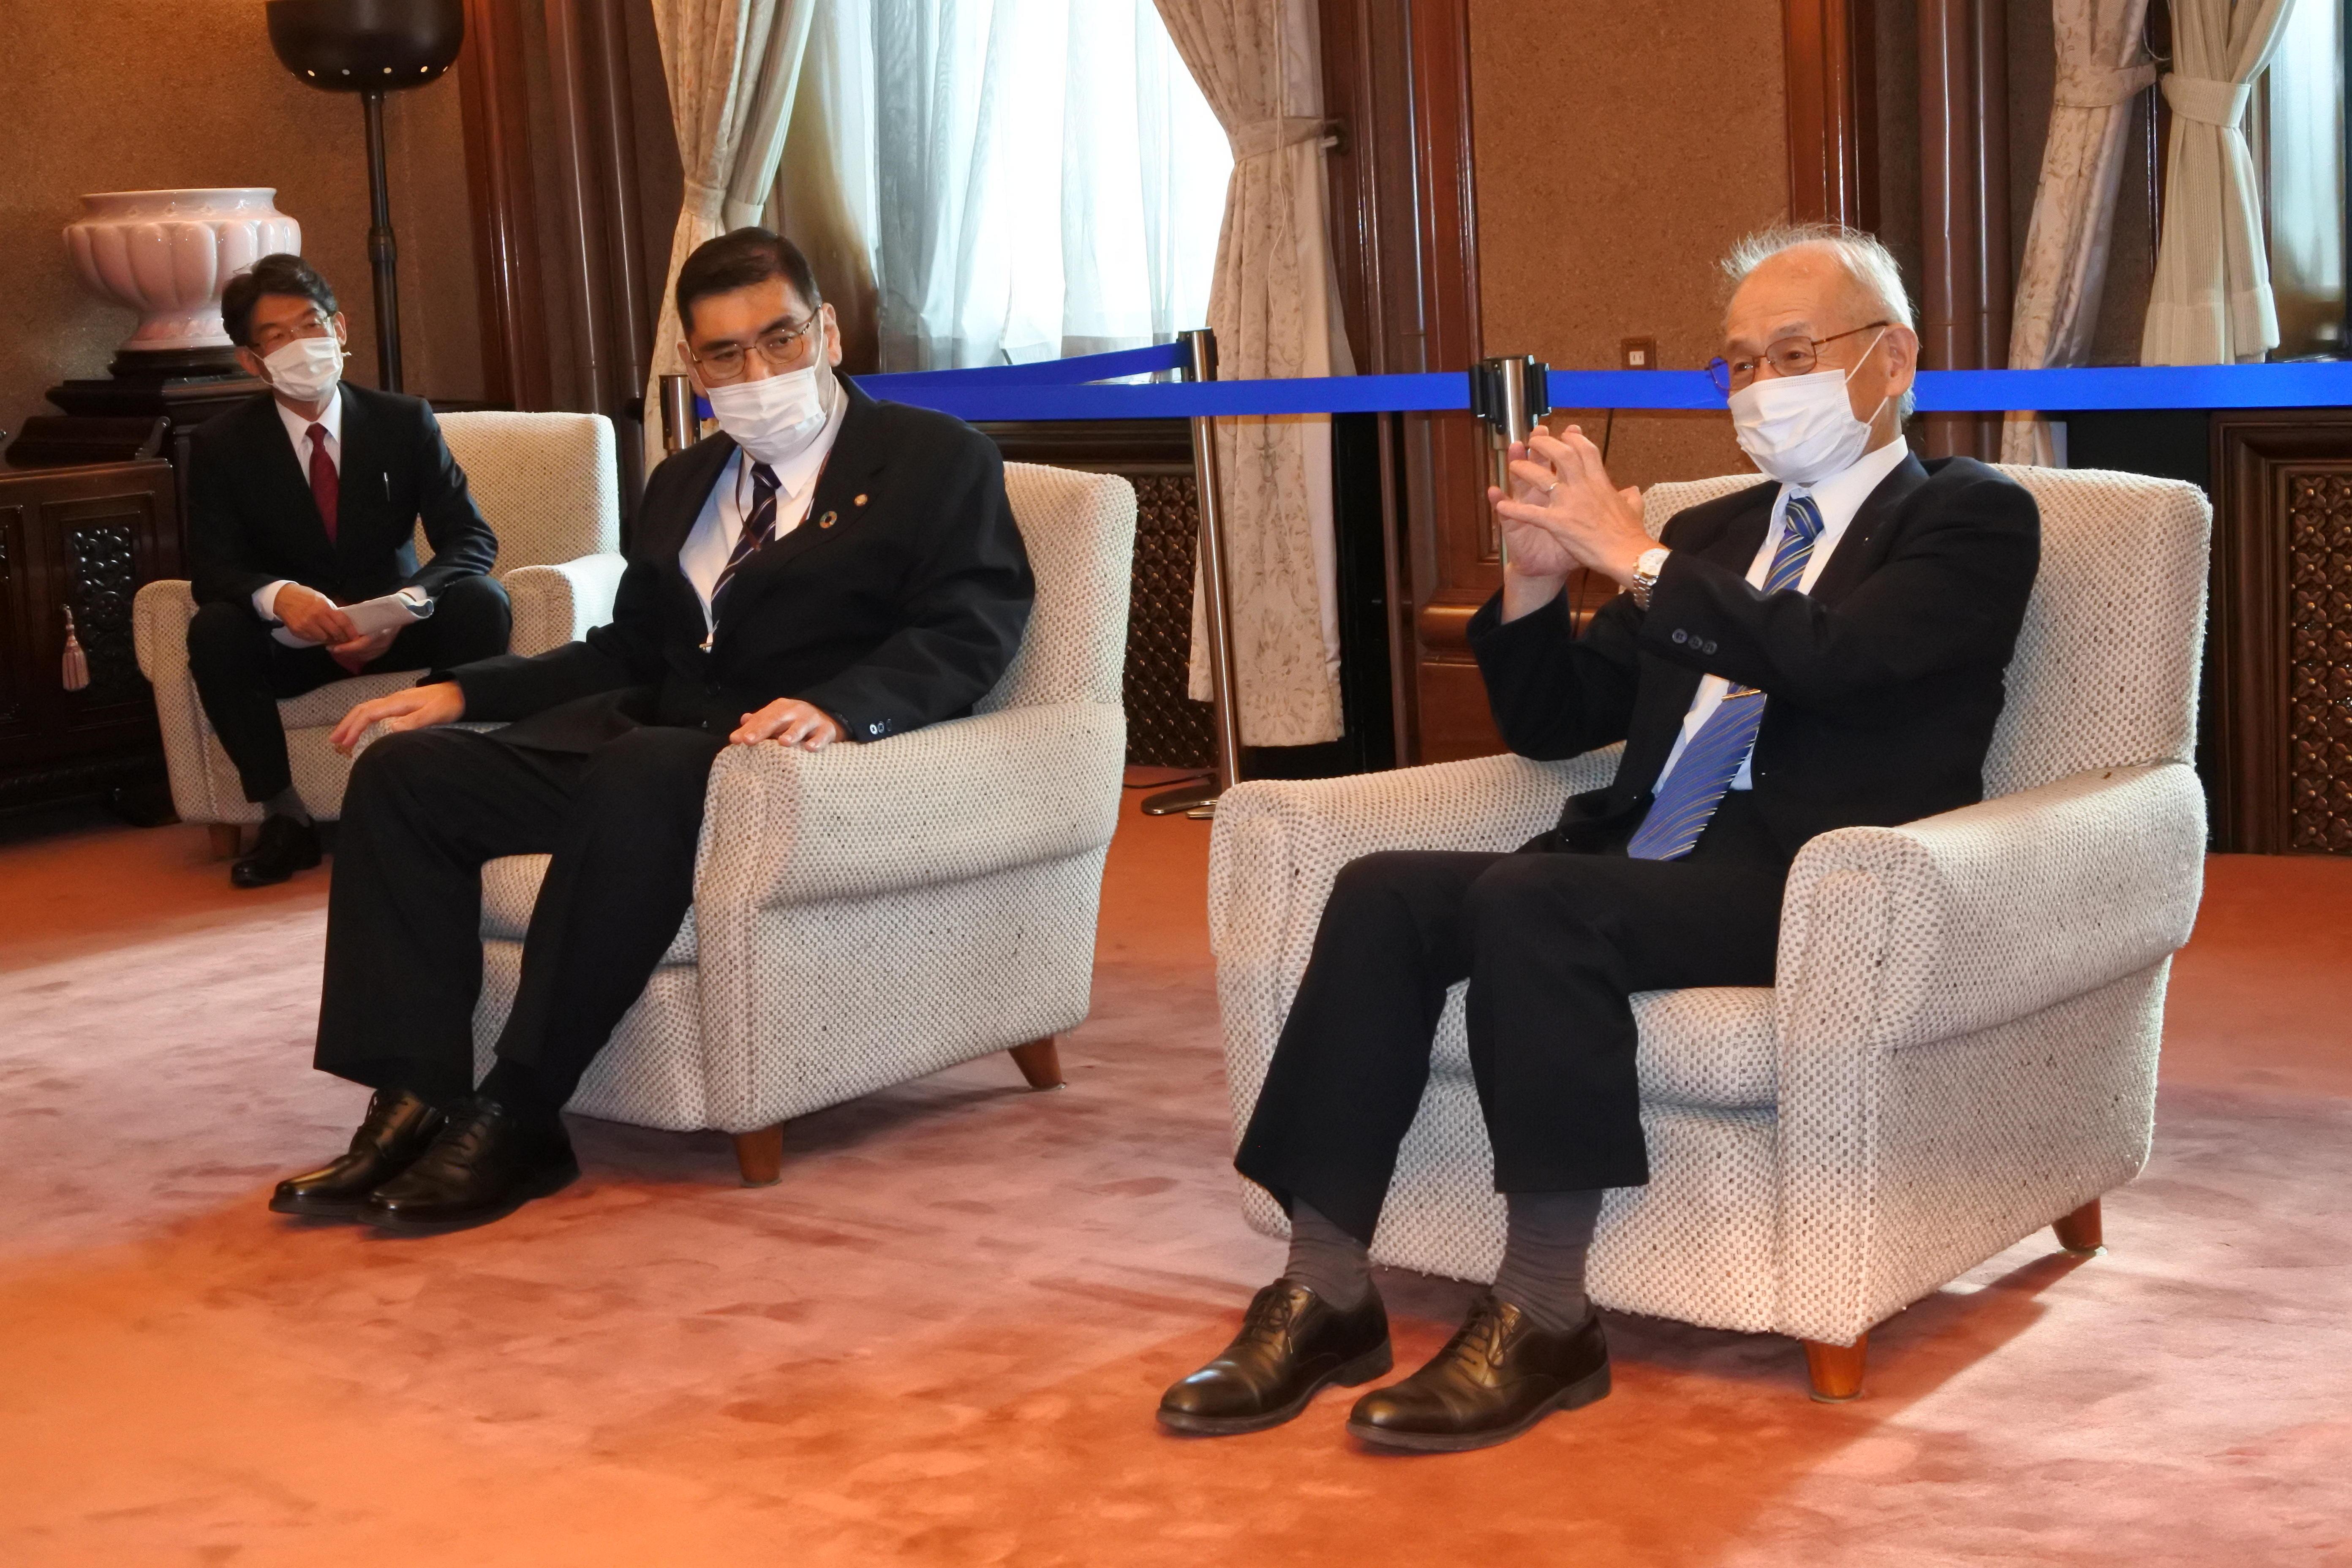 河村市長と懇談する吉野教授と、小原章裕学長(中央)、矢野幾也事務局次長